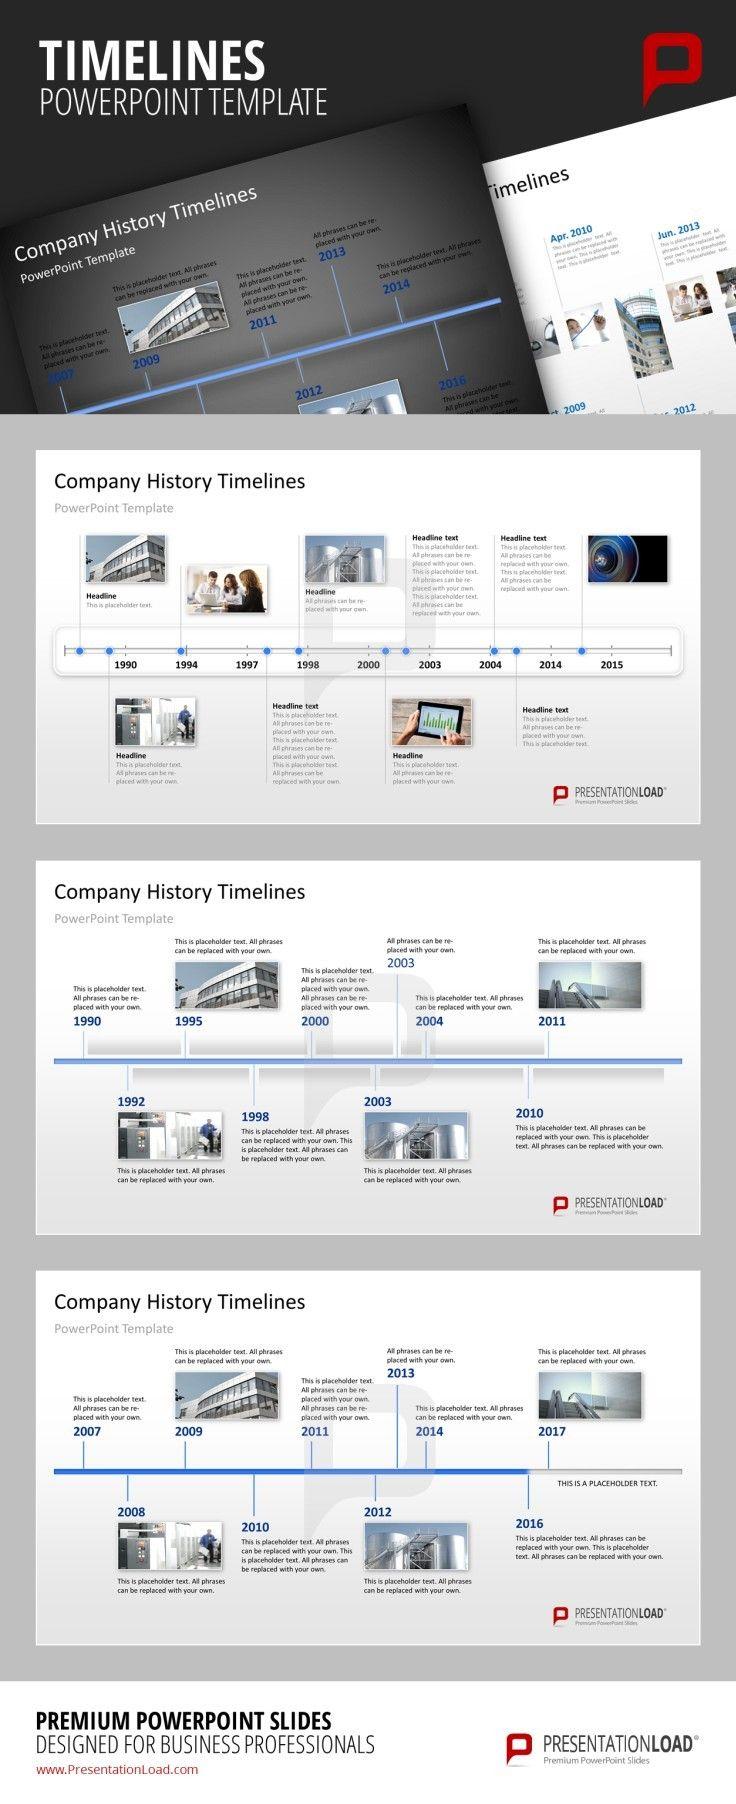 3D Spheres Timeline PowerPoint Template #presentationload www.presentationl...